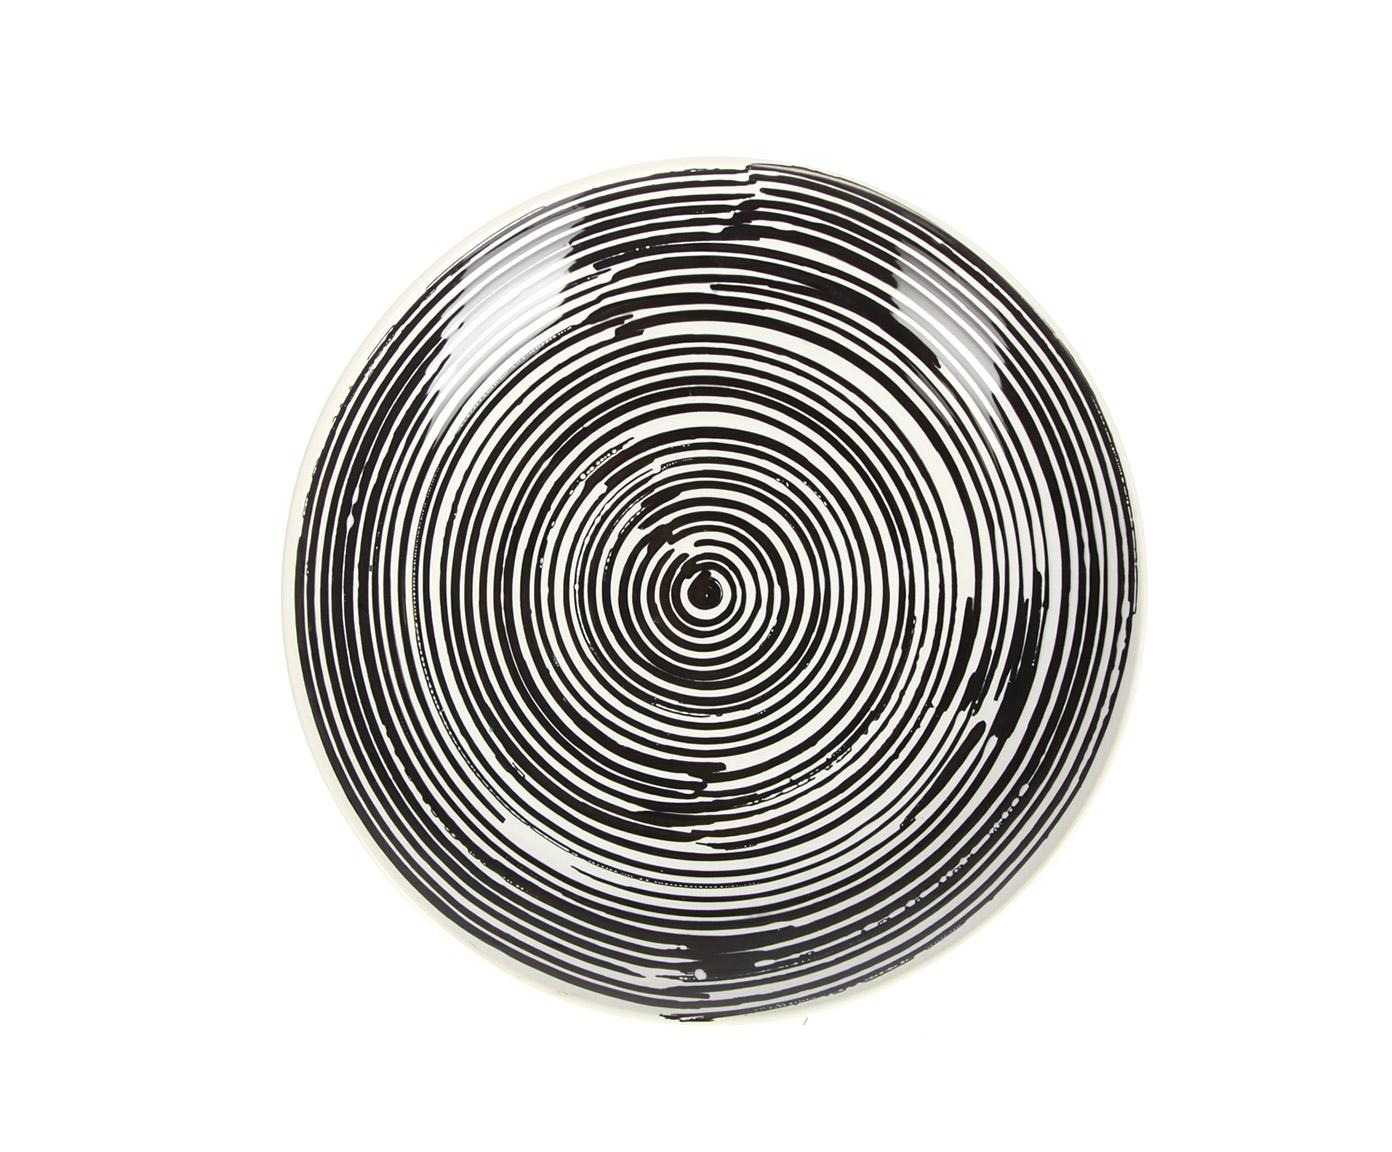 Декоративная тарелка Farol 15430062 от thefurnish